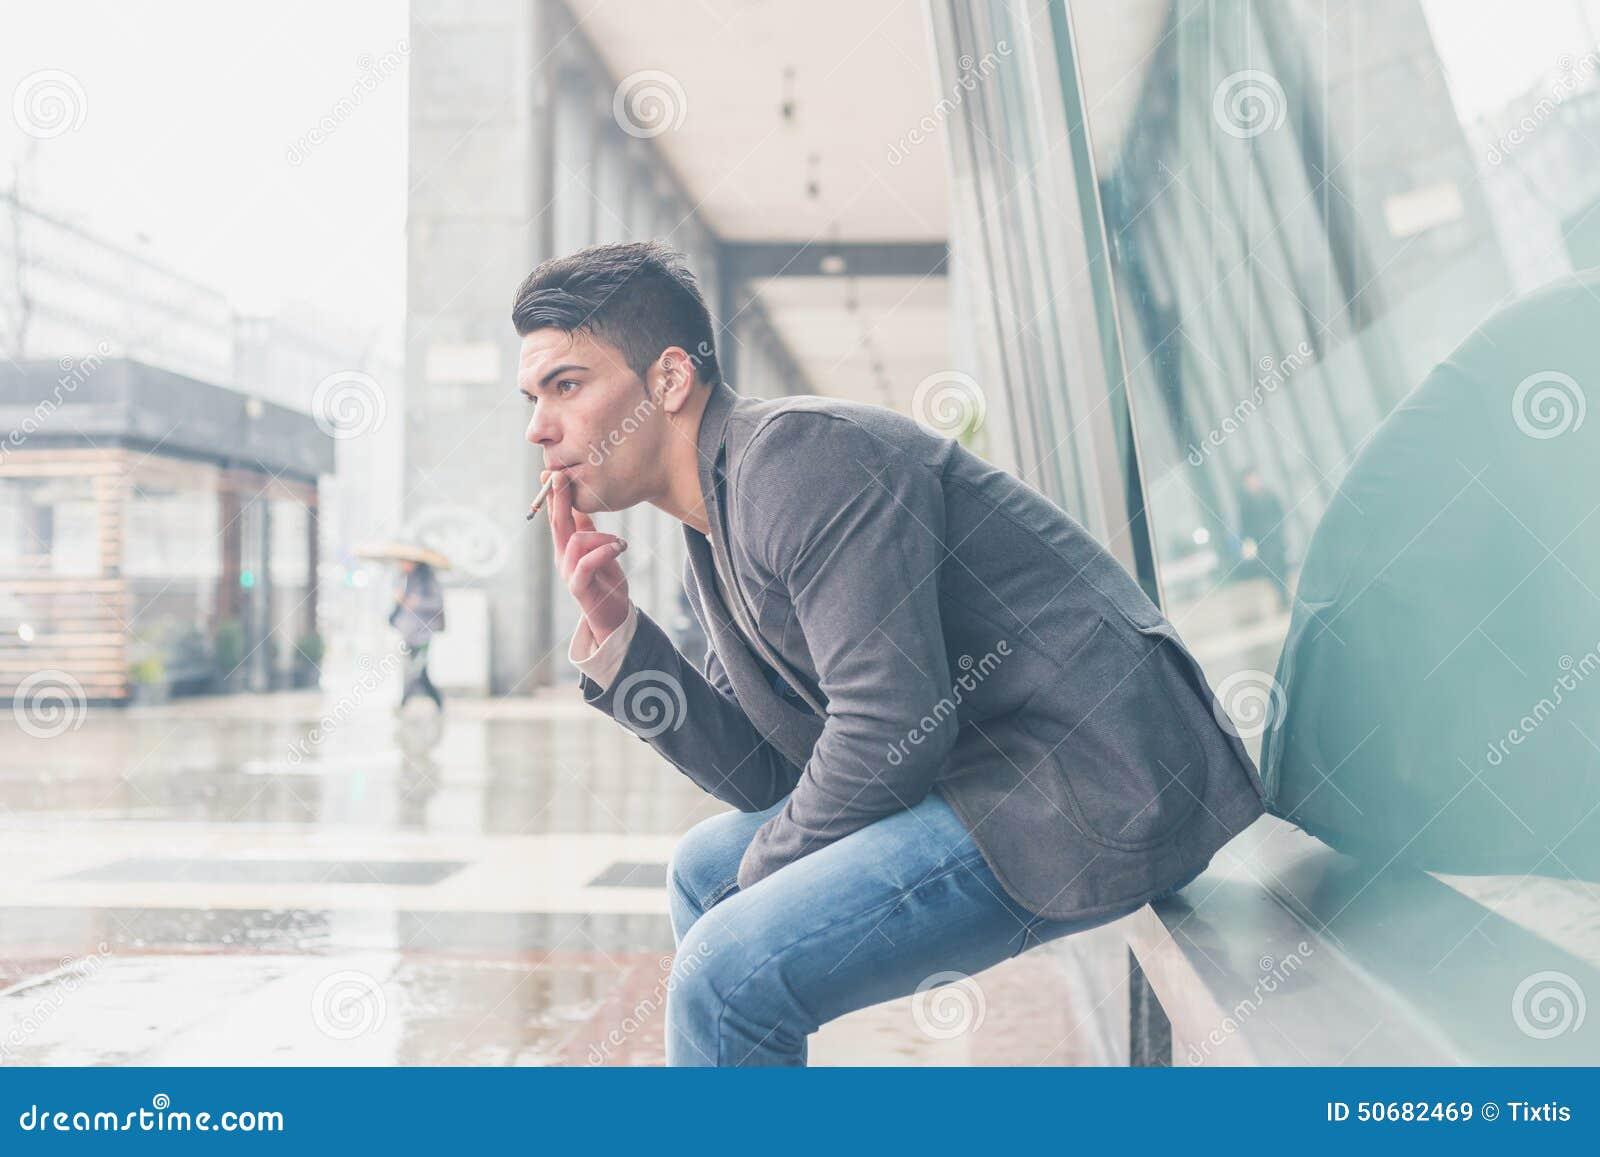 Download 抽香烟的年轻英俊的人 库存图片. 图片 包括有 令人上瘾, 人们, 成人, 全能, 设计, 香烟, 传神 - 50682469